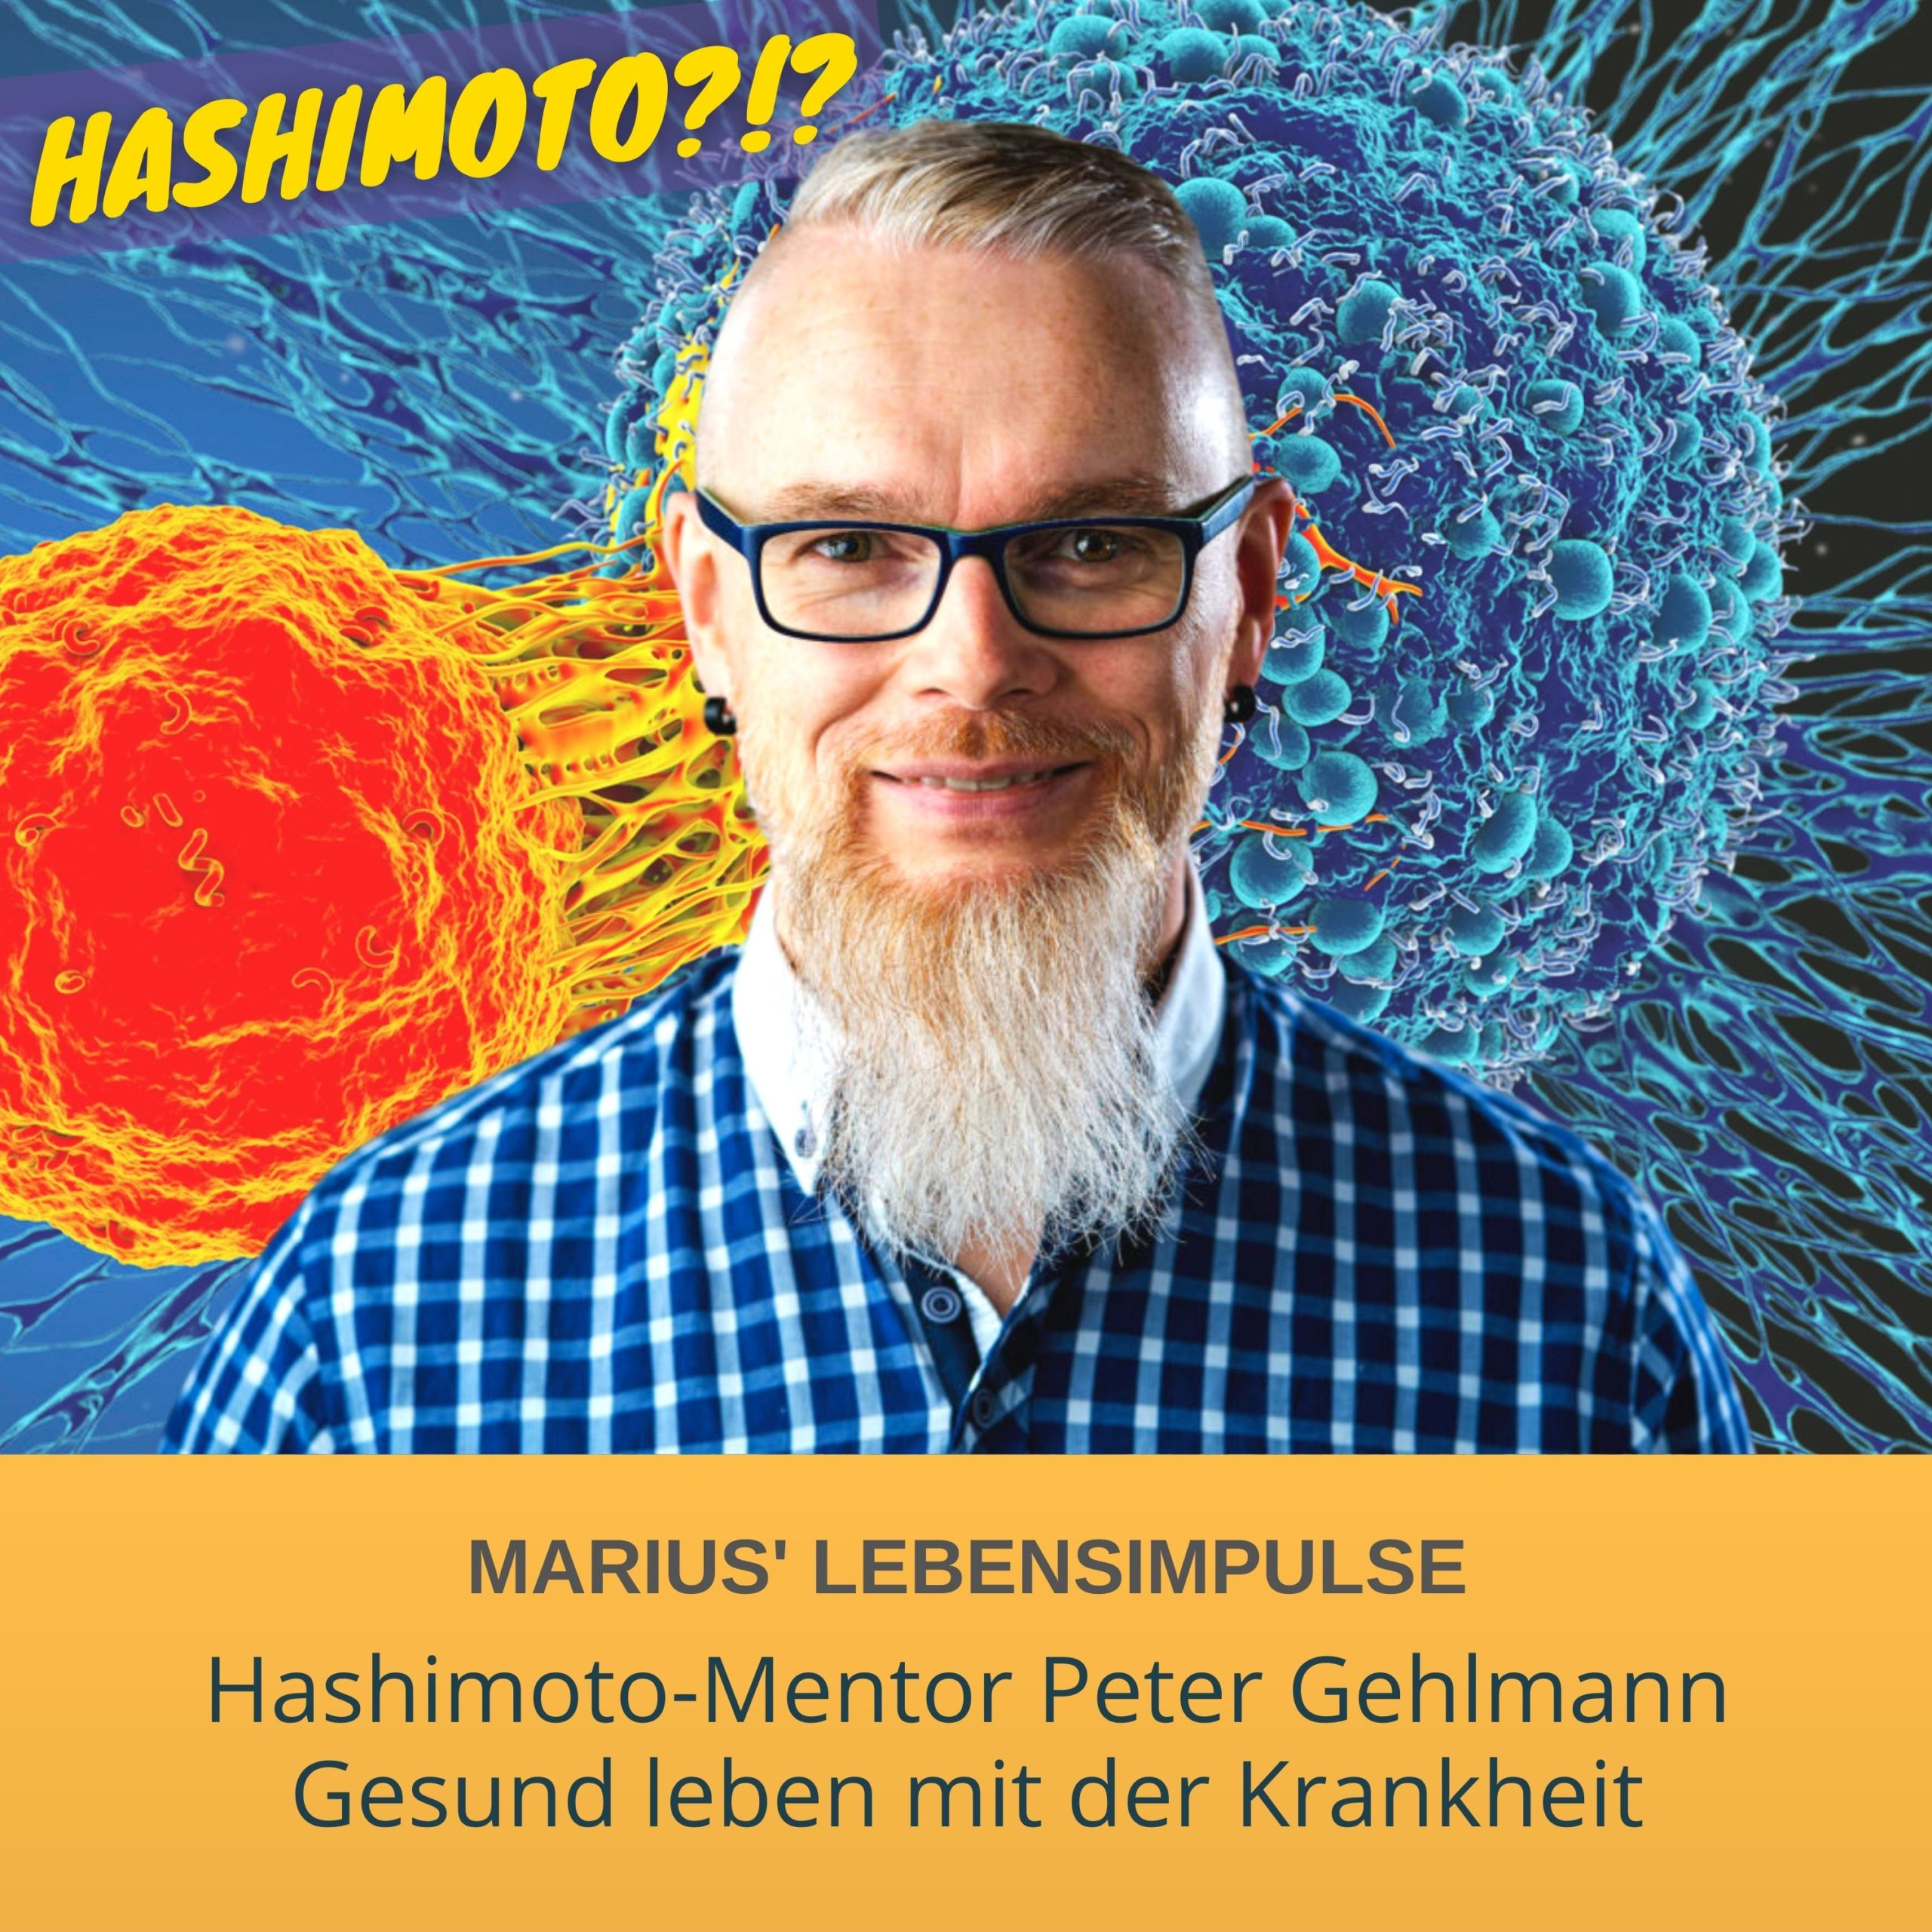 Hashimoto-Mentor Peter Gehlmann